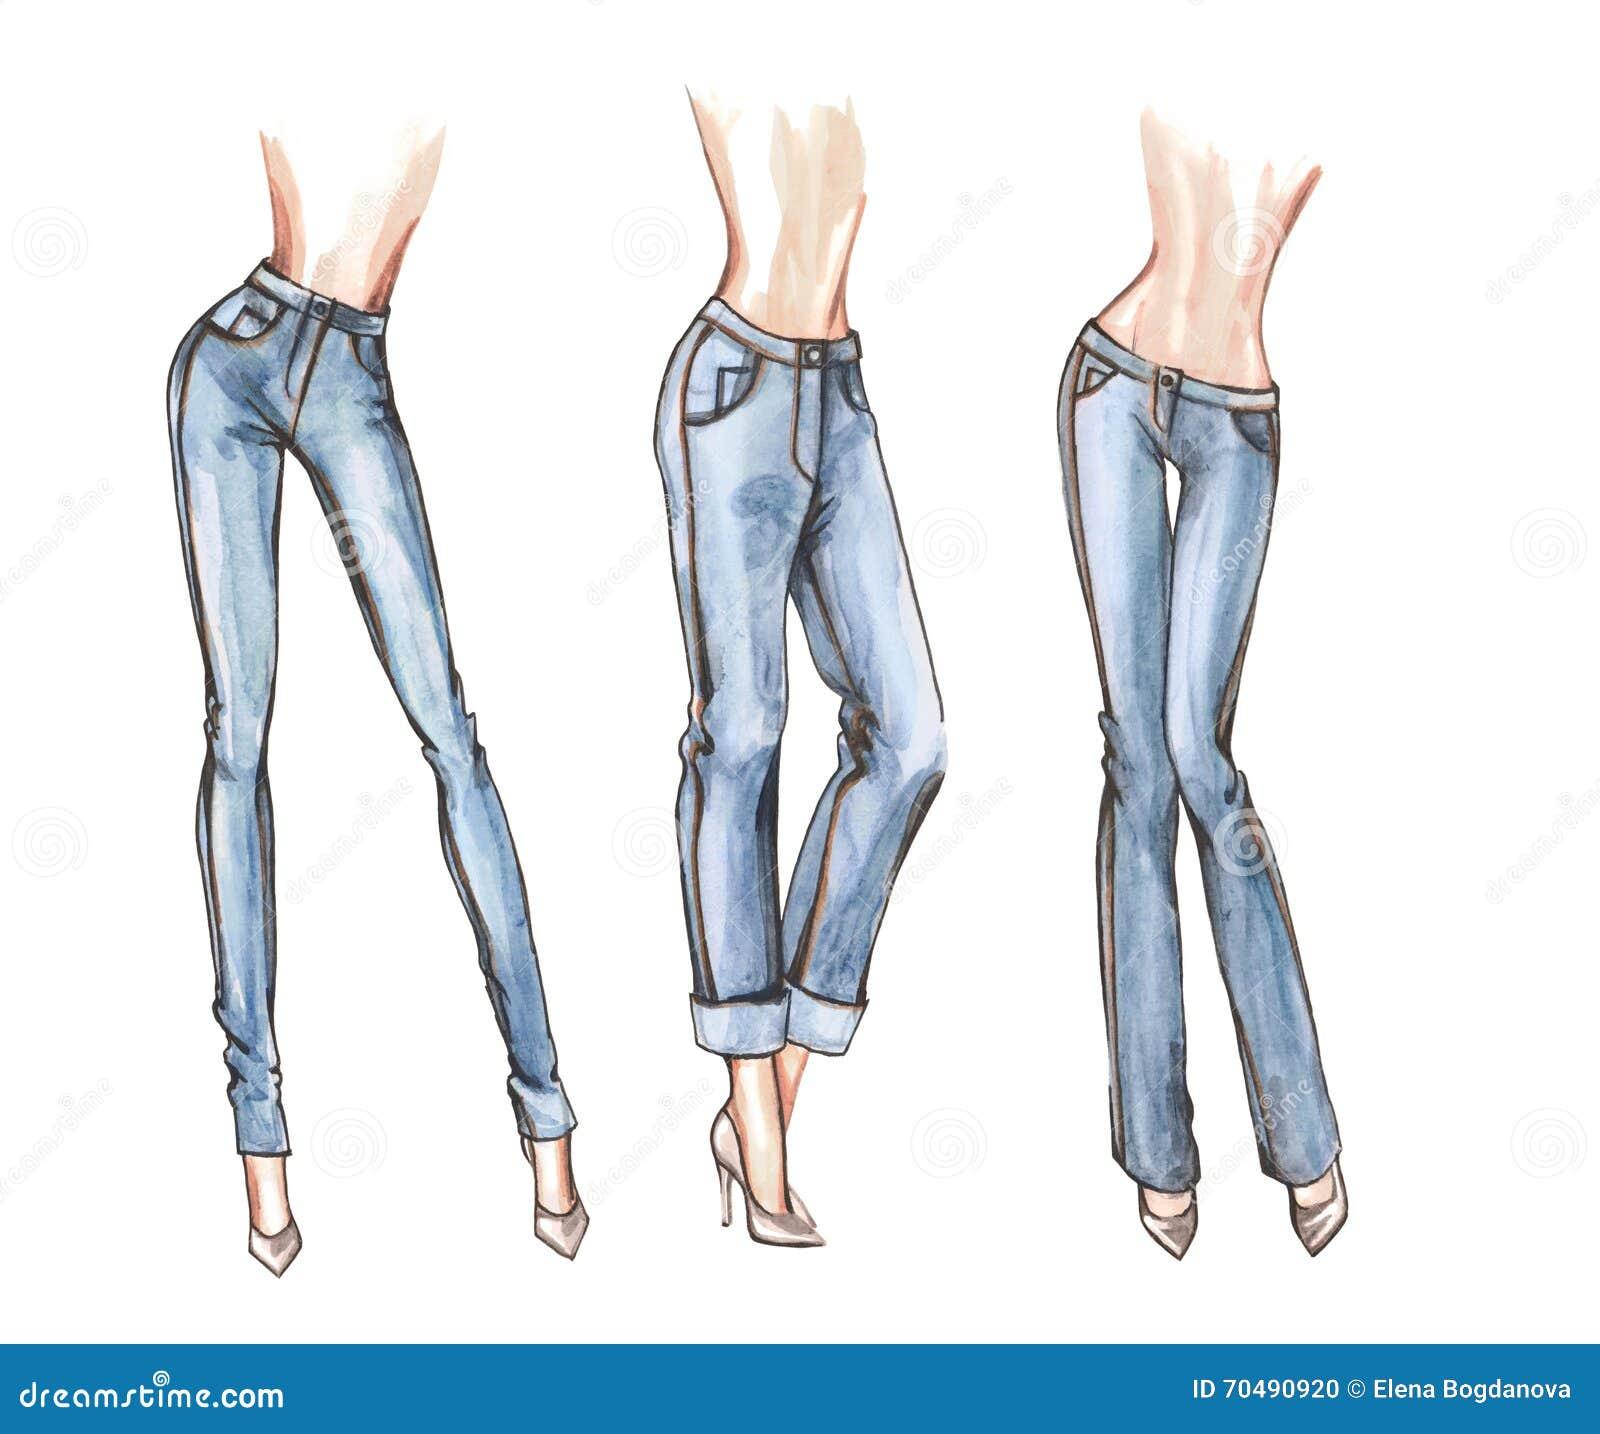 Blue Jeans Watercolor Illustration Stock Illustration - Illustration Of Heels Shoes 70490920